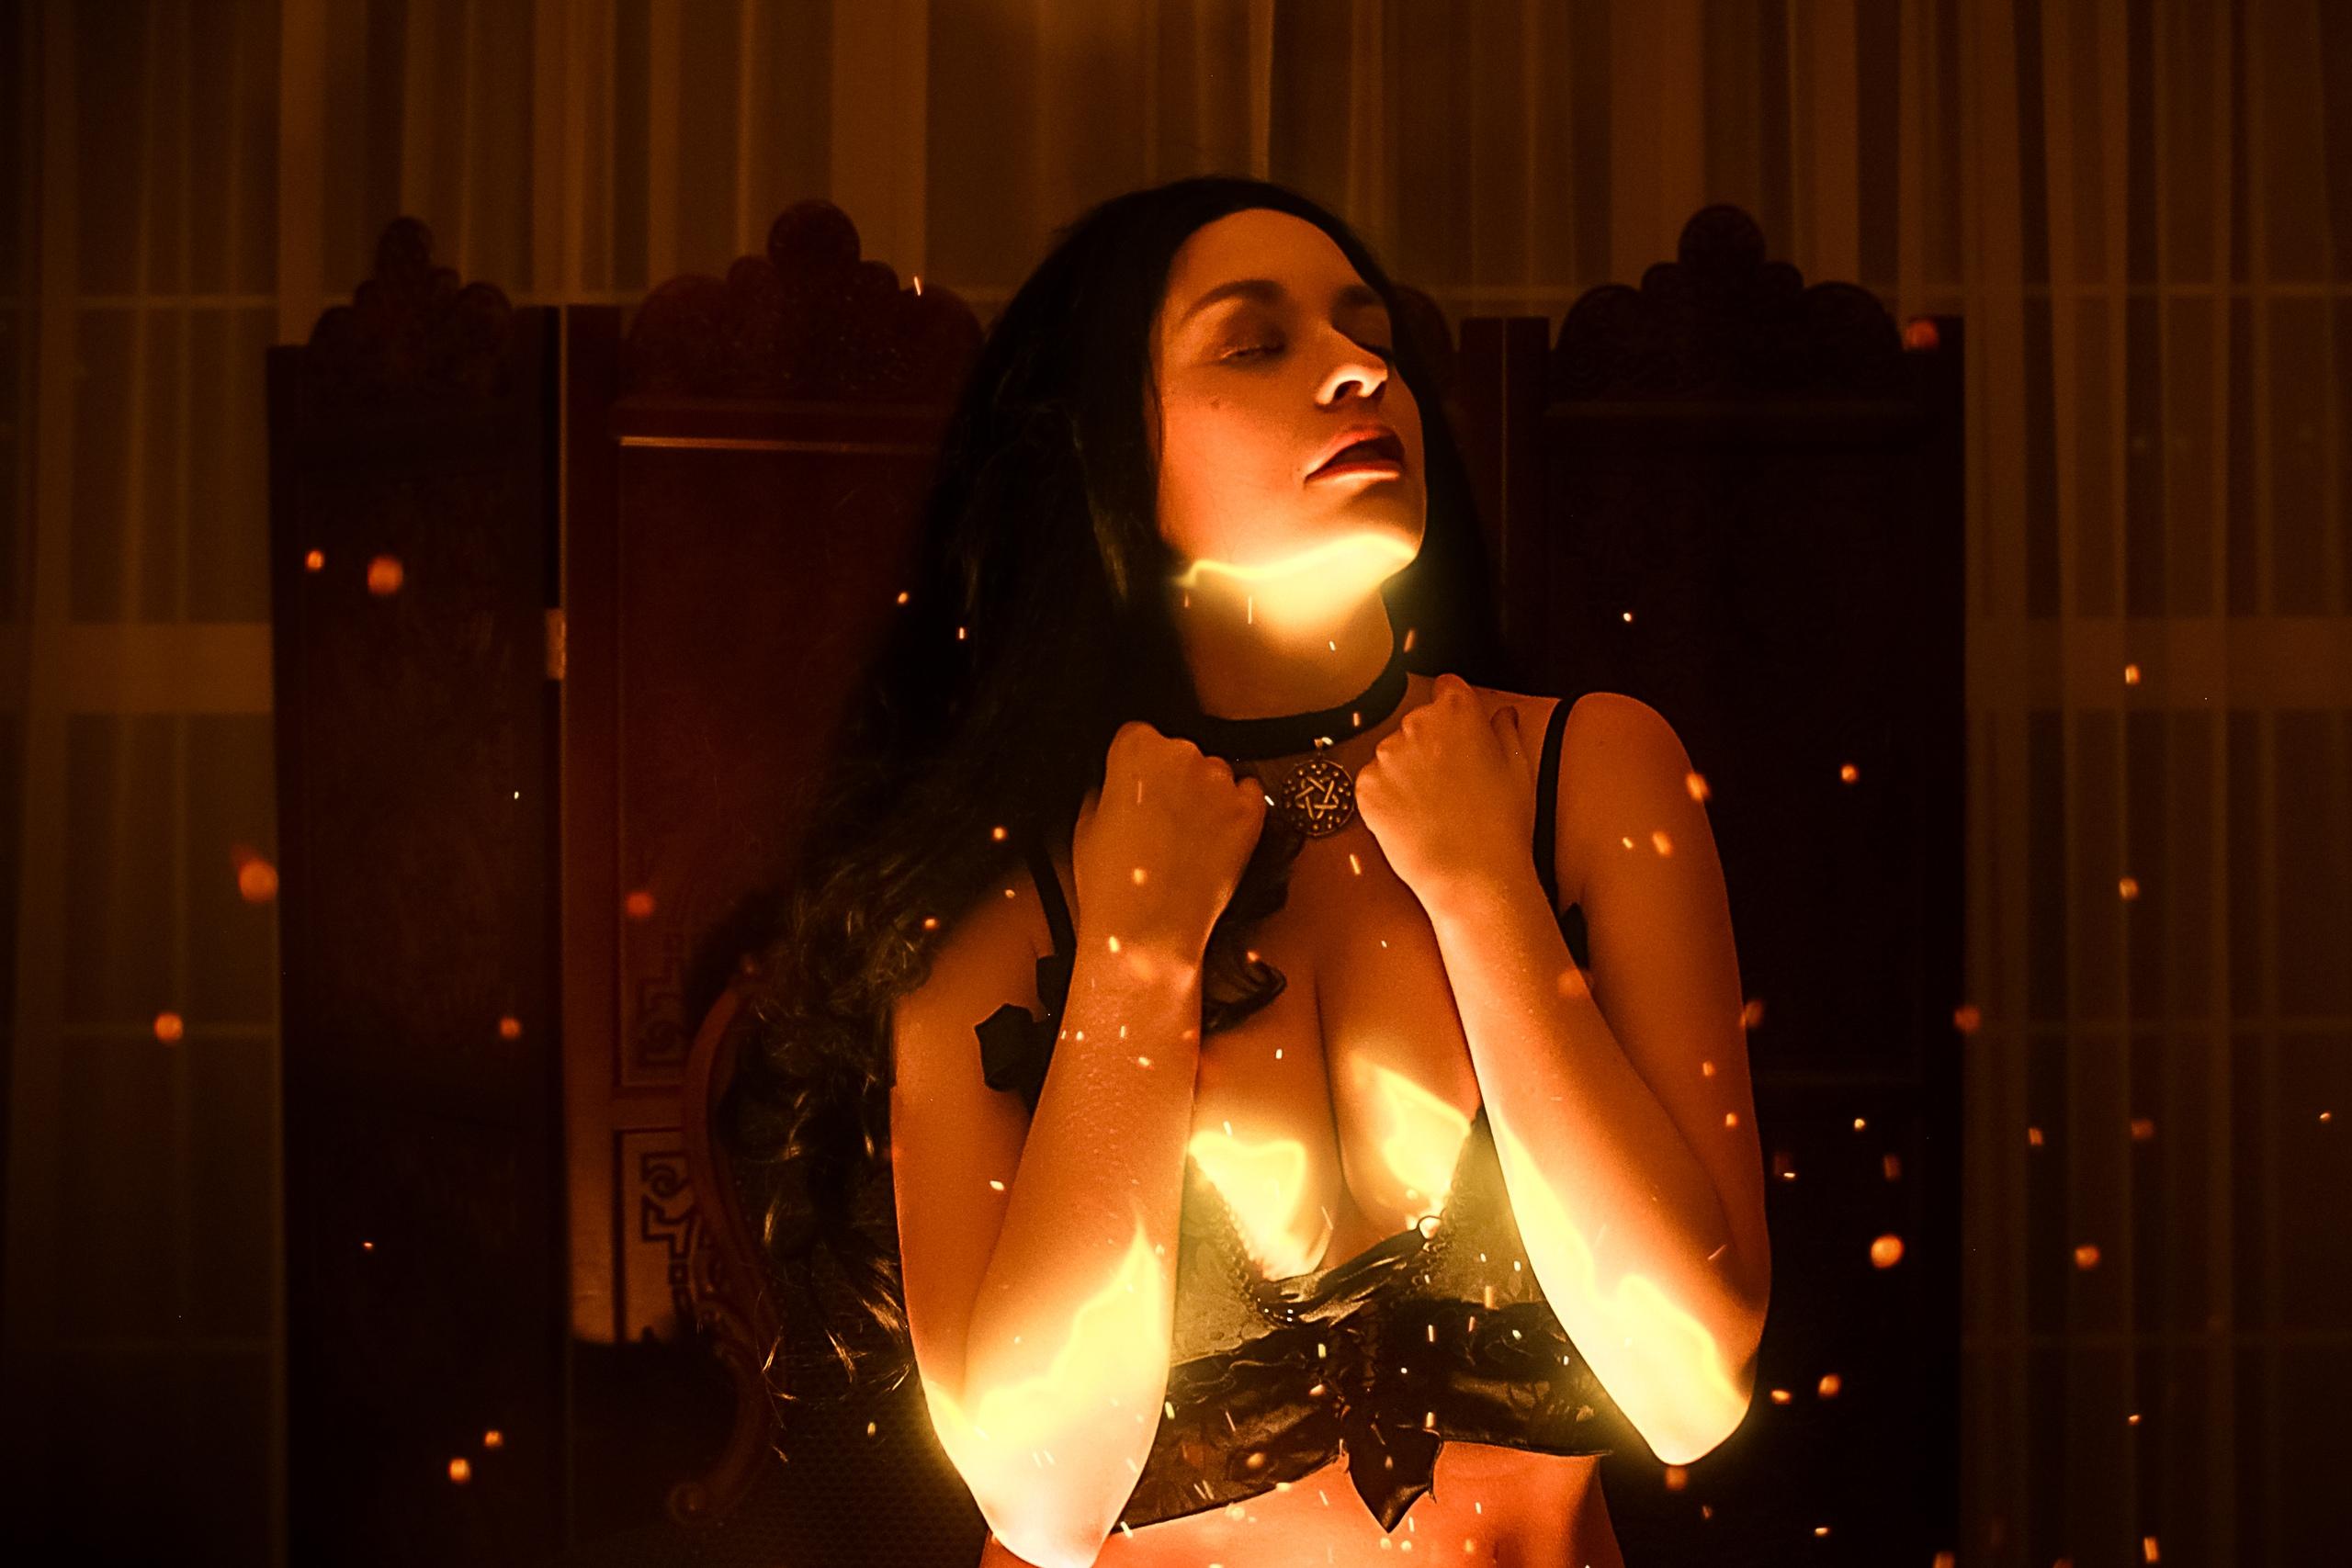 The Witcher Cosplay: Волшебные образы от Fragaria Zefir